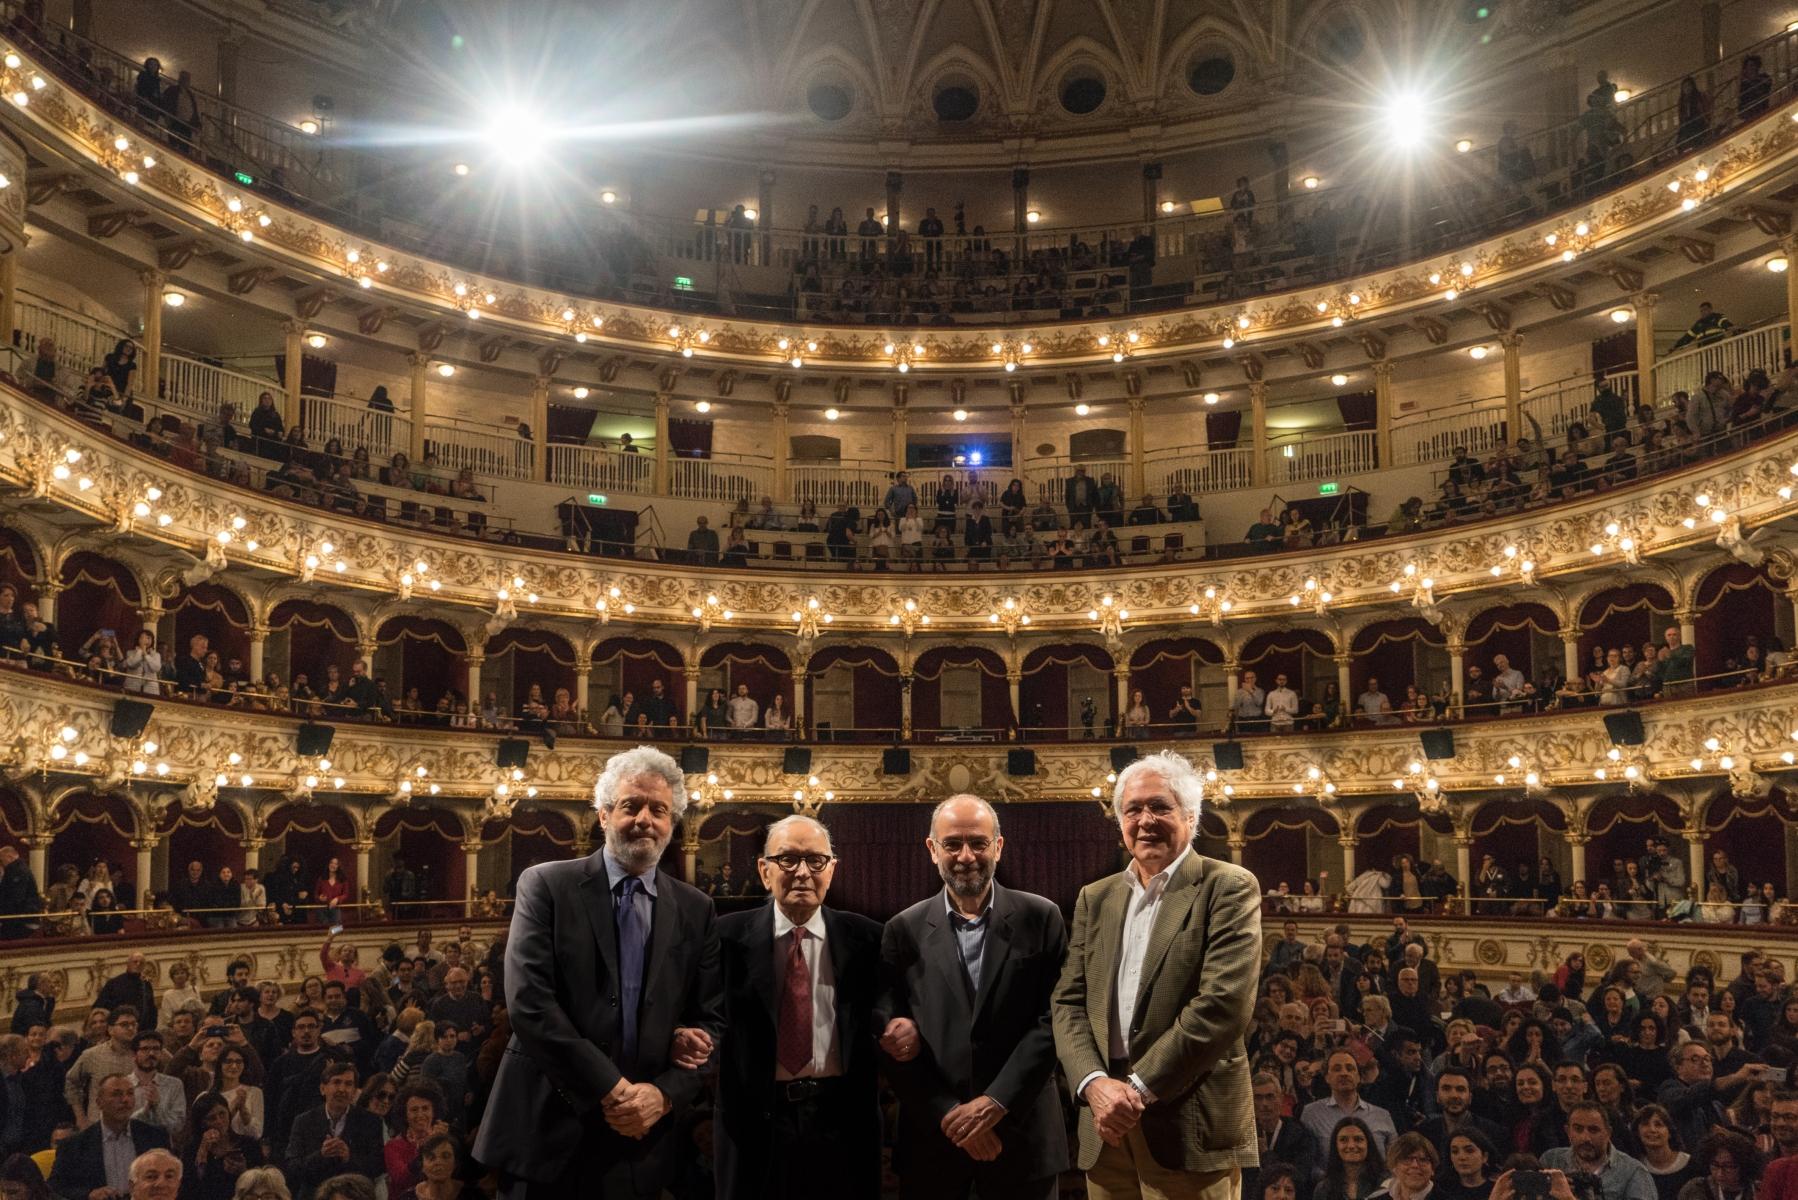 Four Oscar Winners : Piovani, Morricone, Tornatore, Quaranta